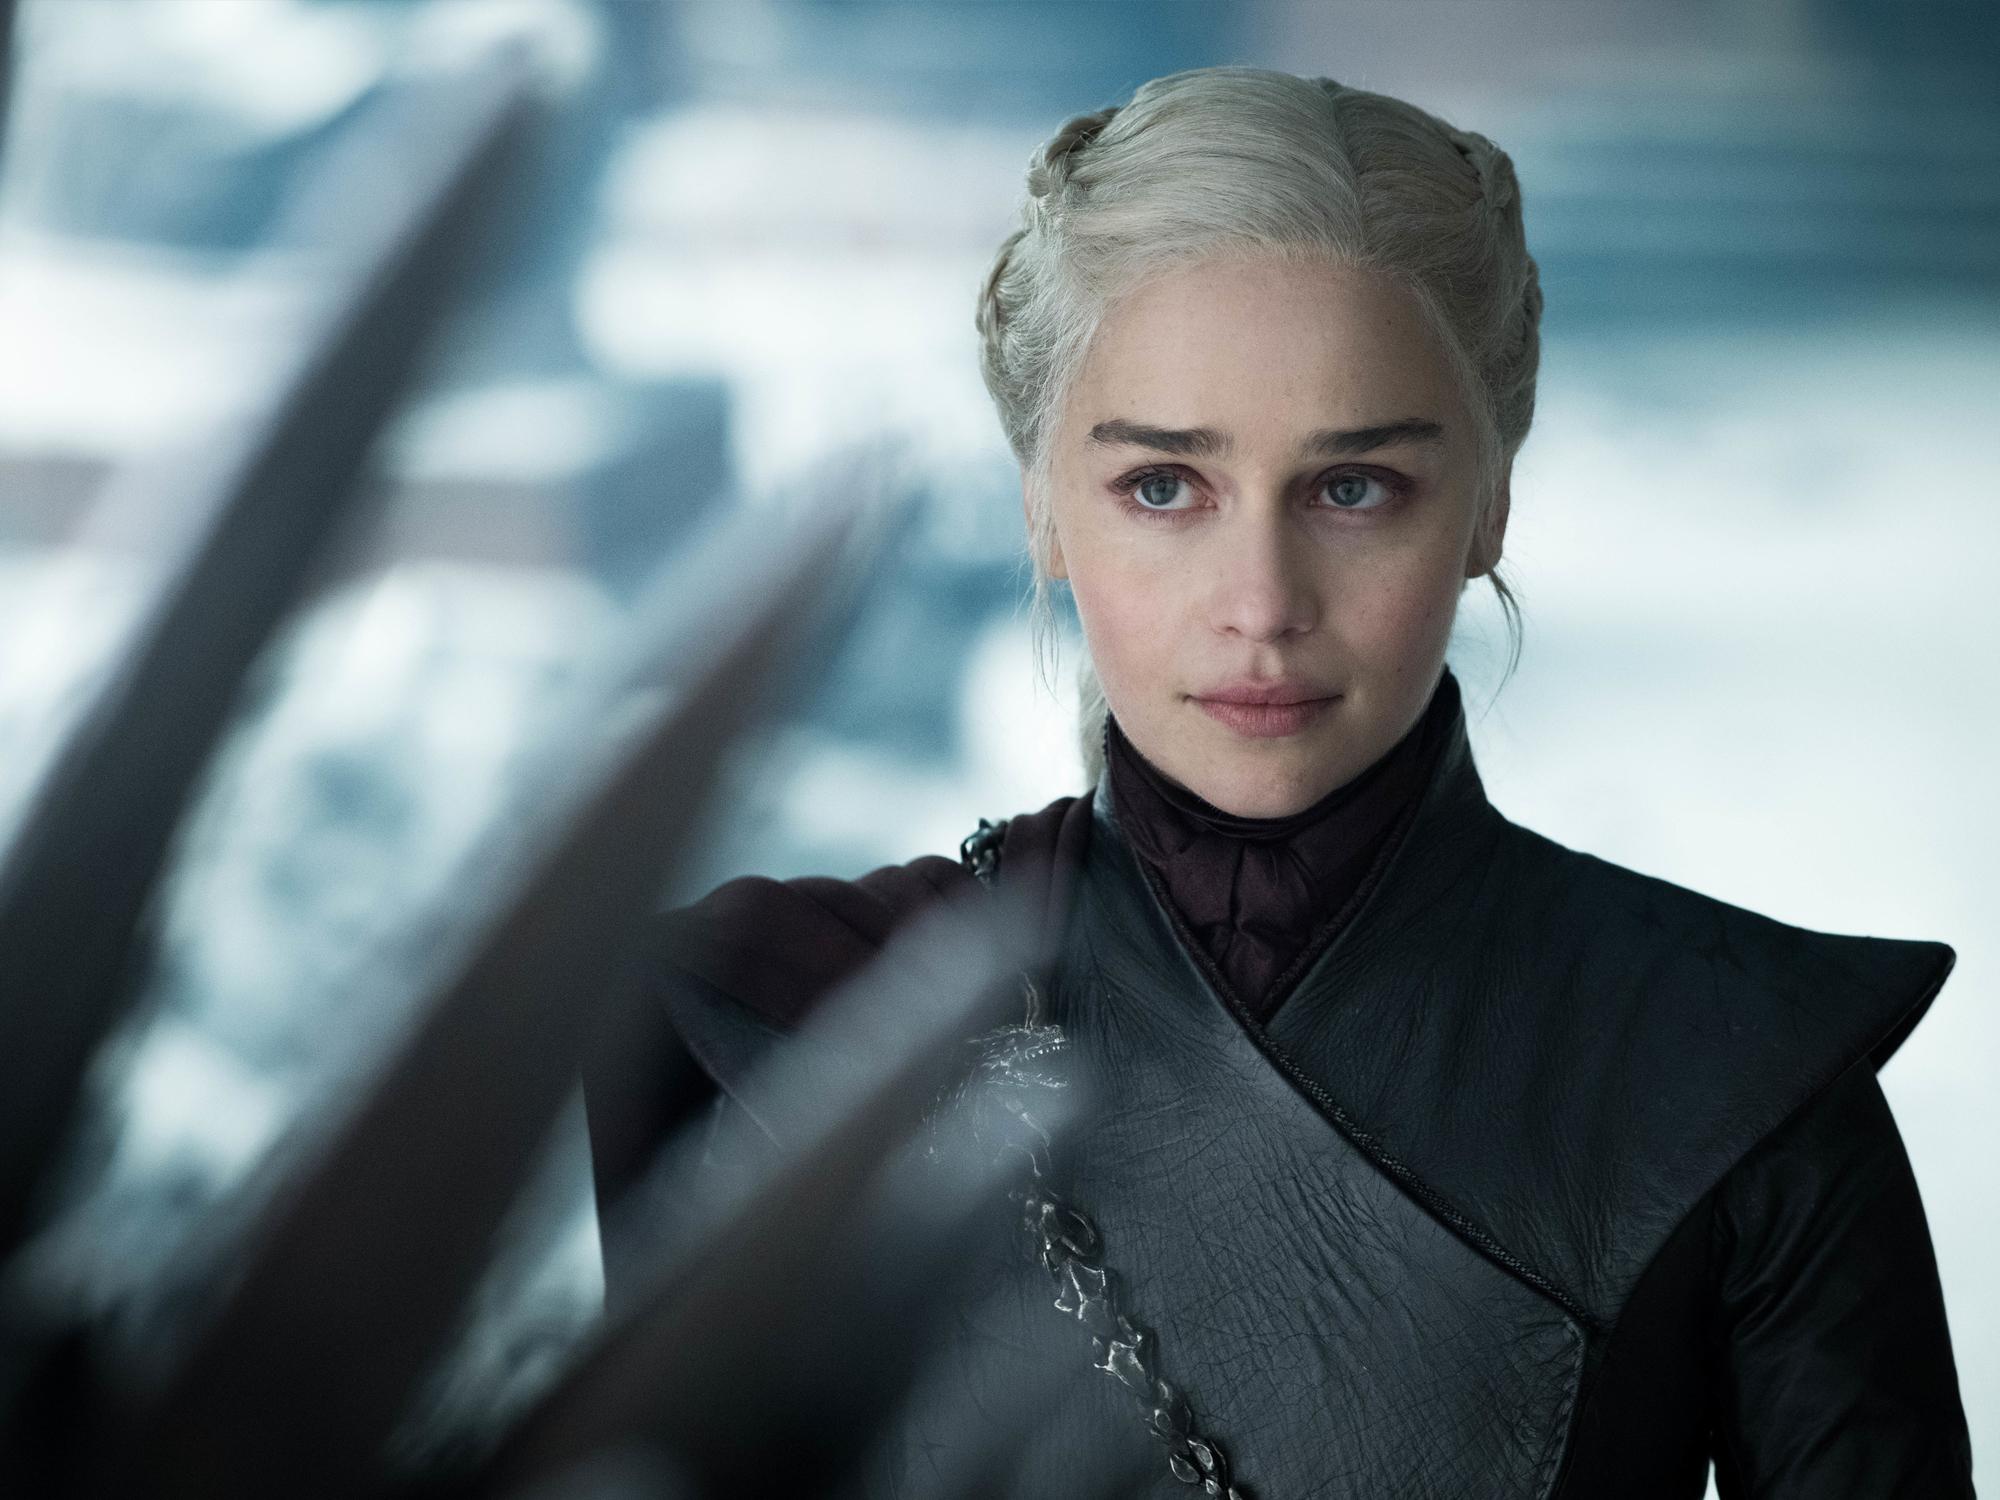 Game-of-Thrones-The-Iron-Throne.jpg